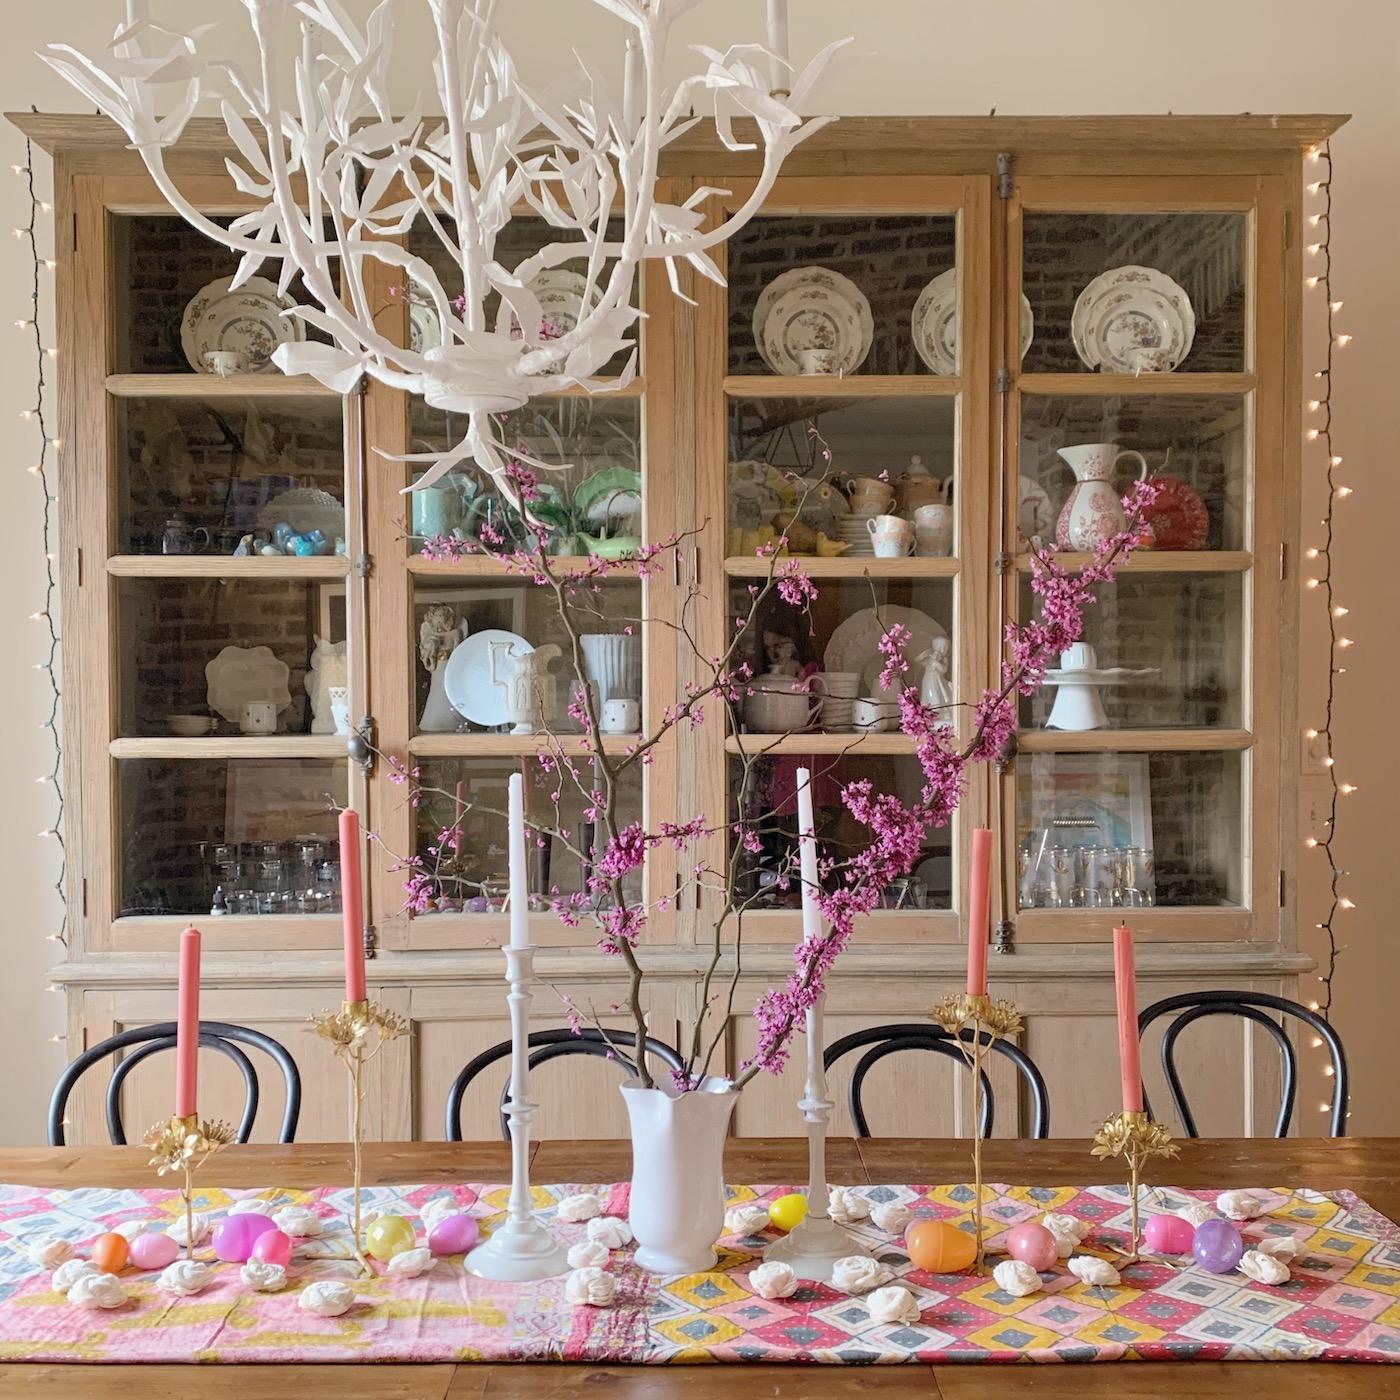 Spring/Easter dining room decor